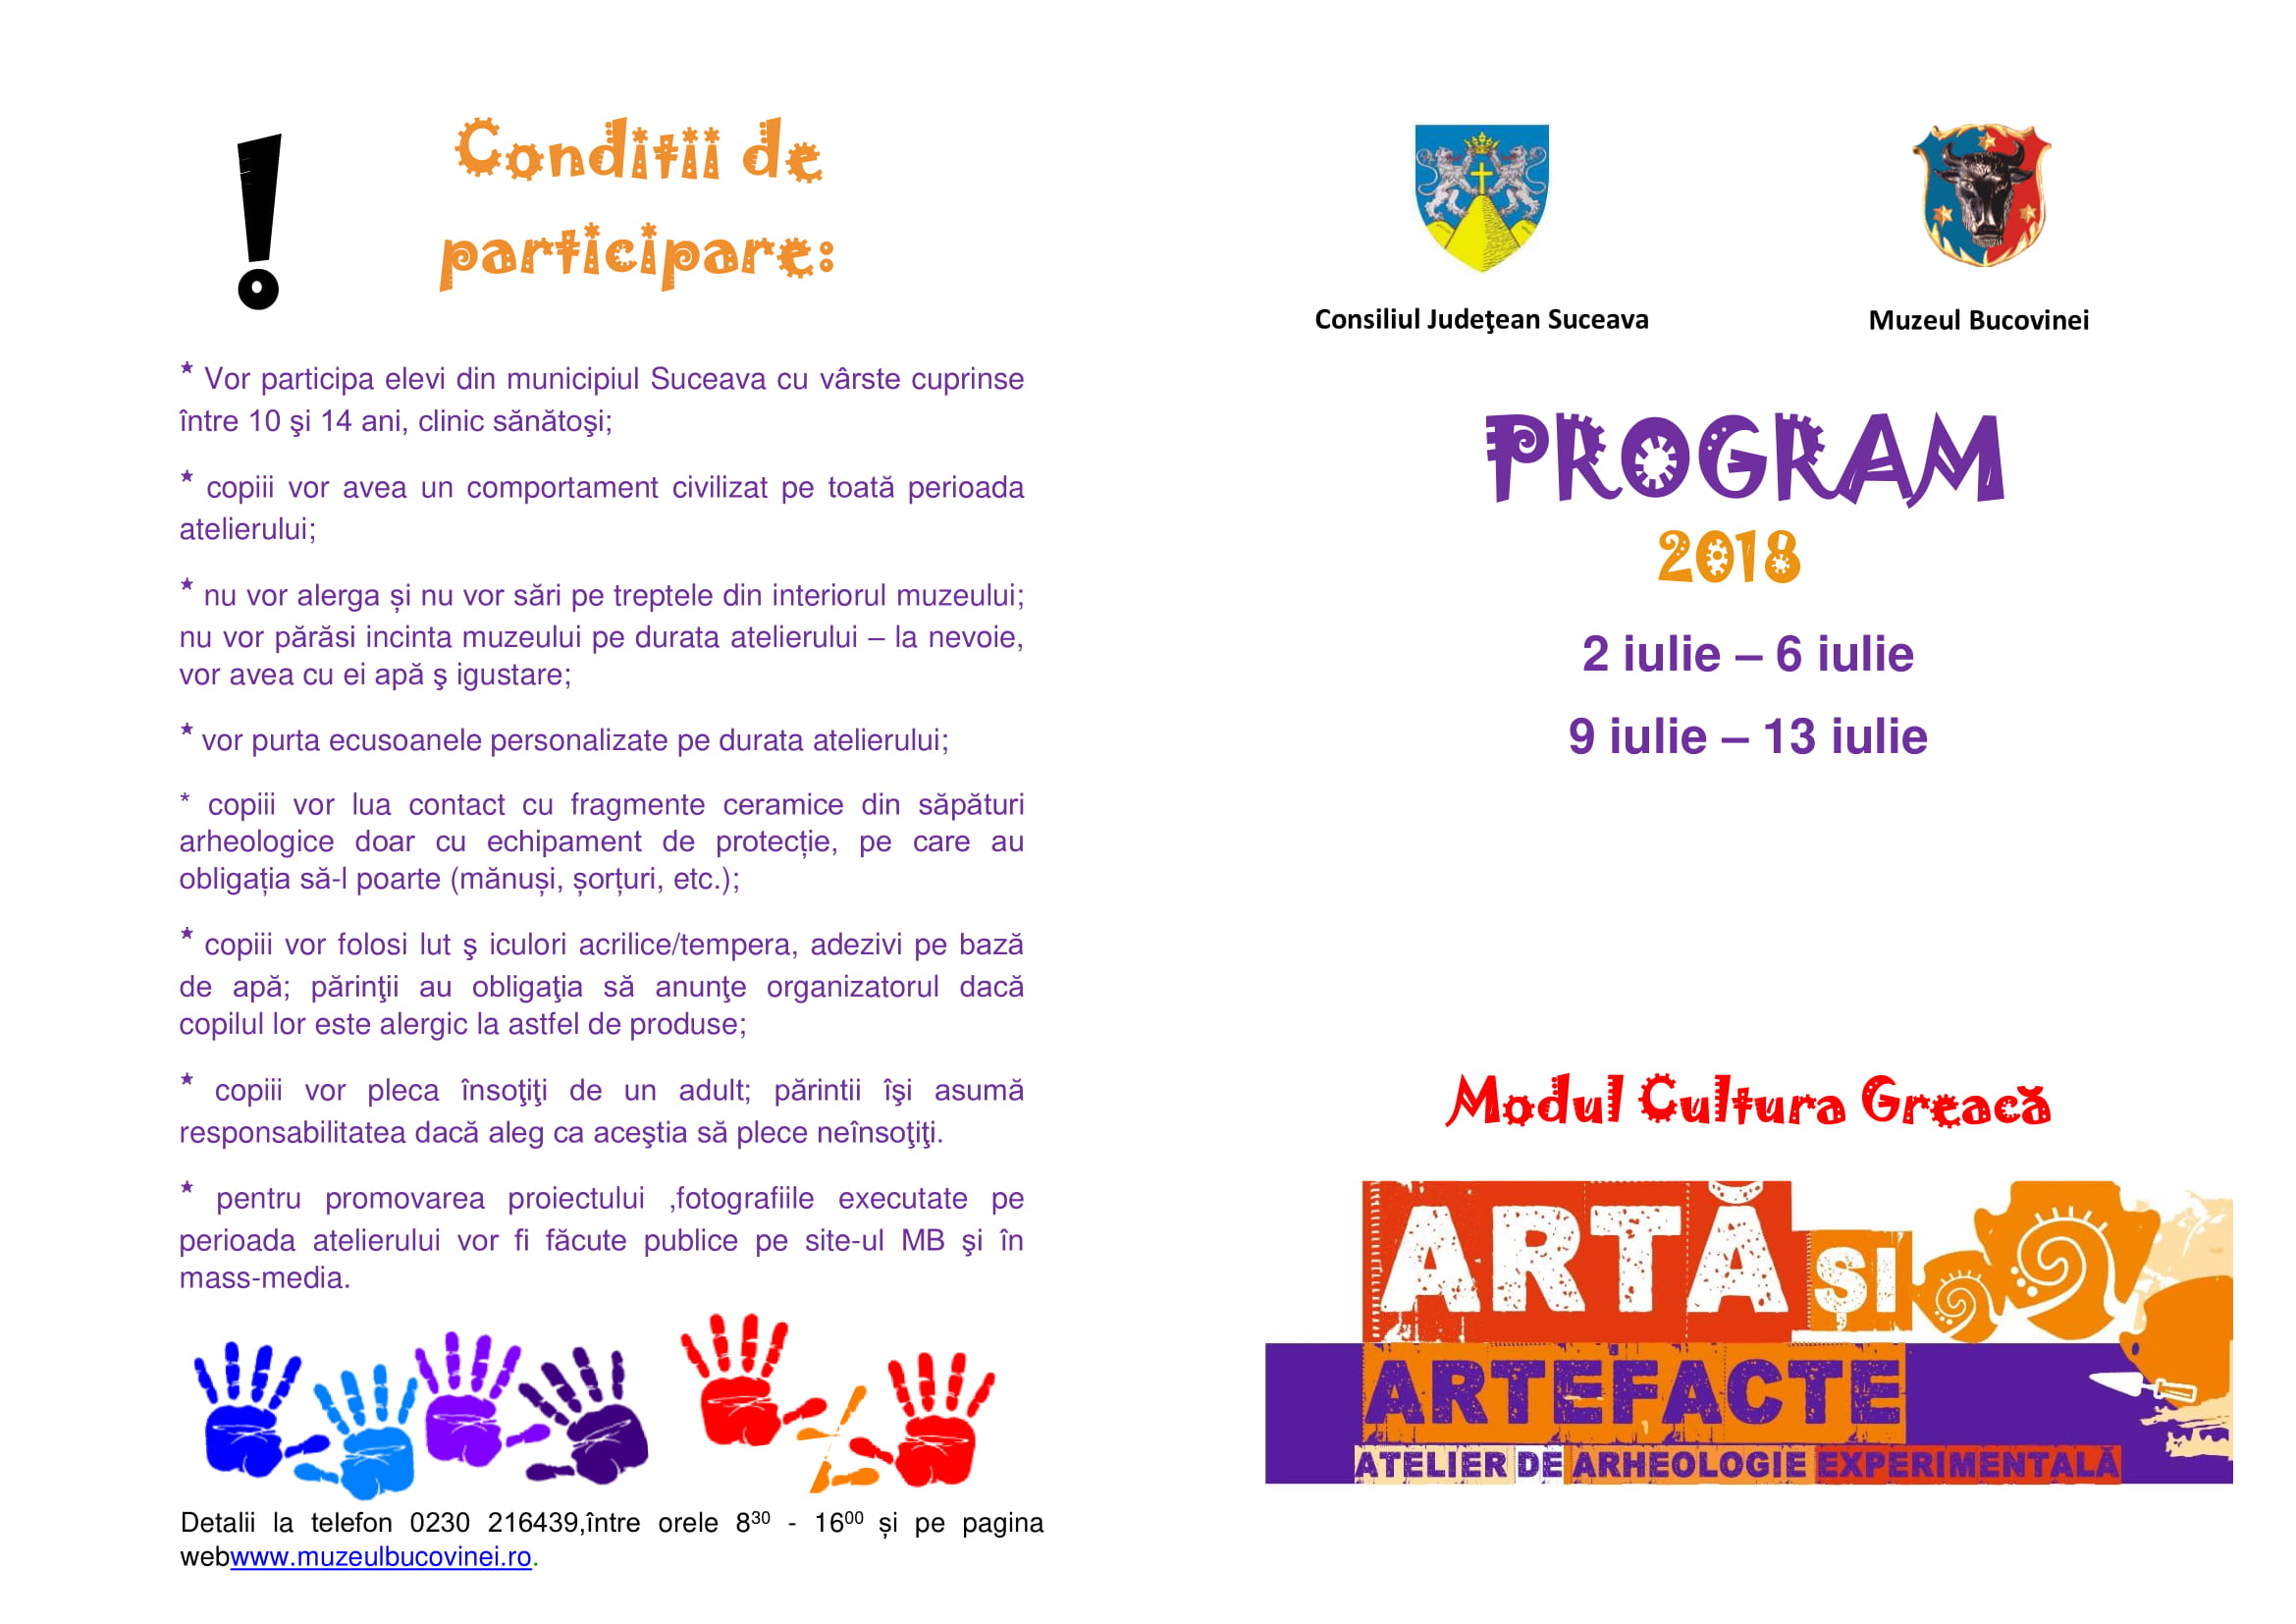 program ateliere de arh exp GRECIA 2018-1